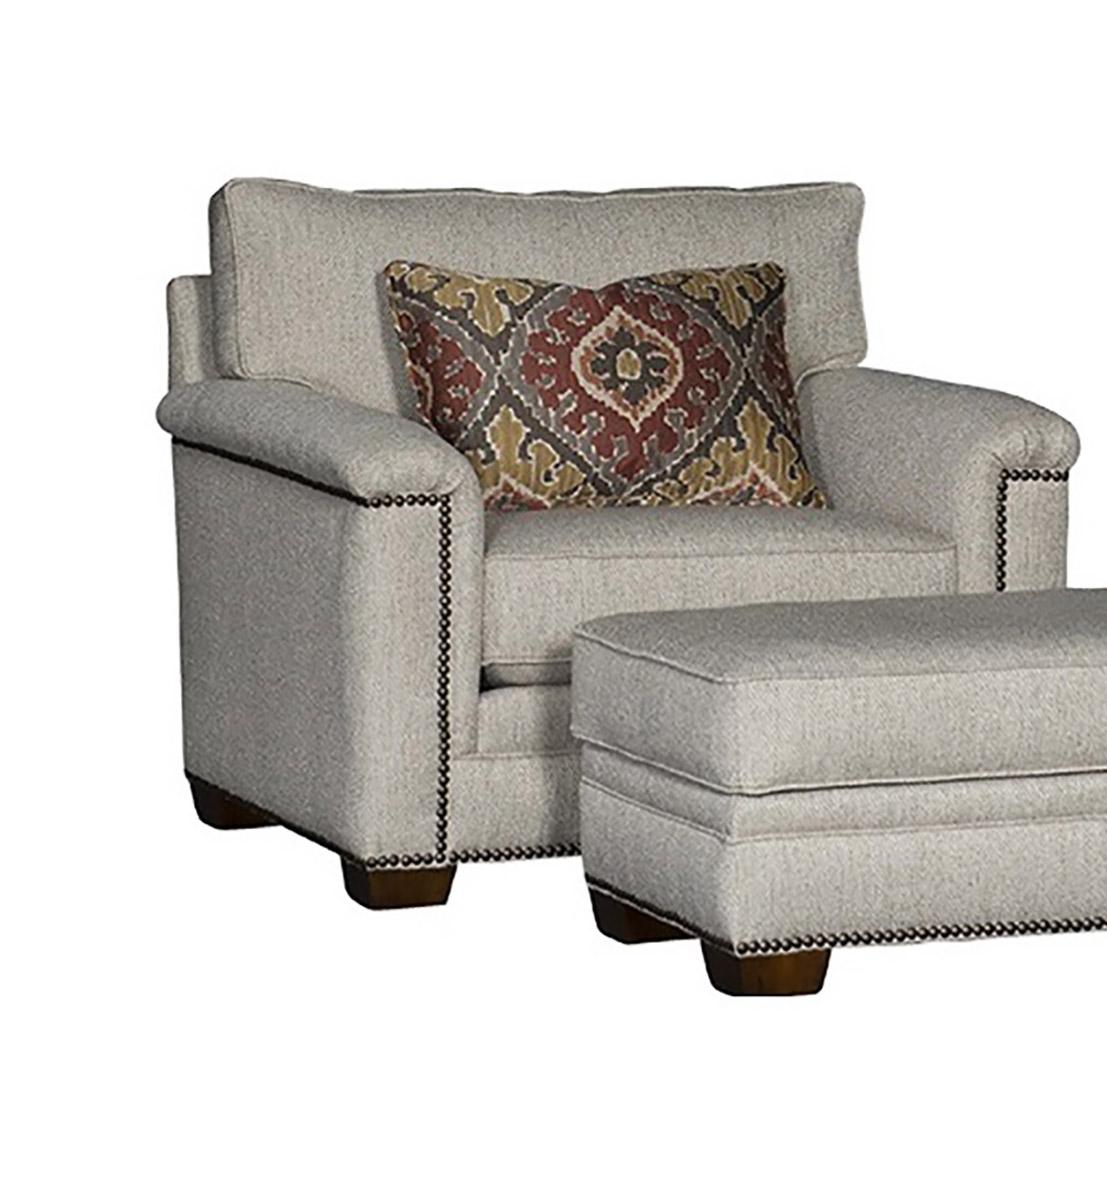 Chelsea Home Southbridge Chair - Beige